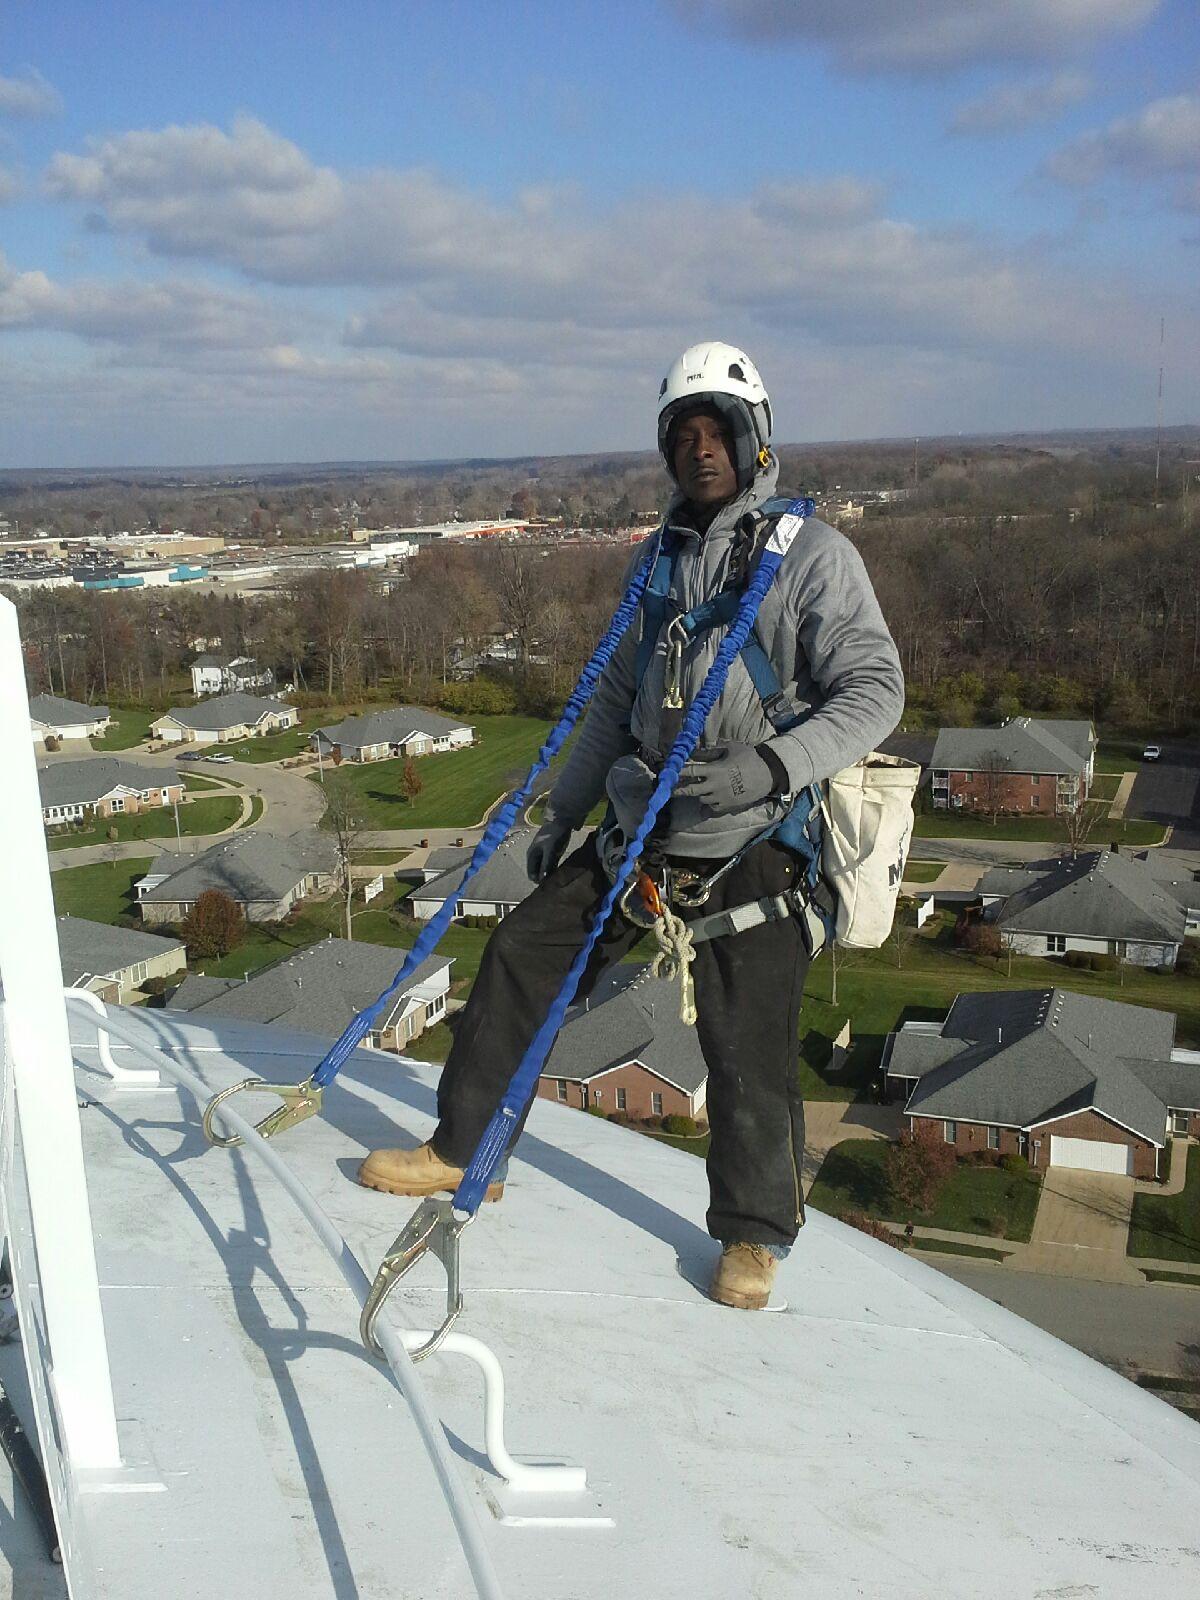 tower climber at work